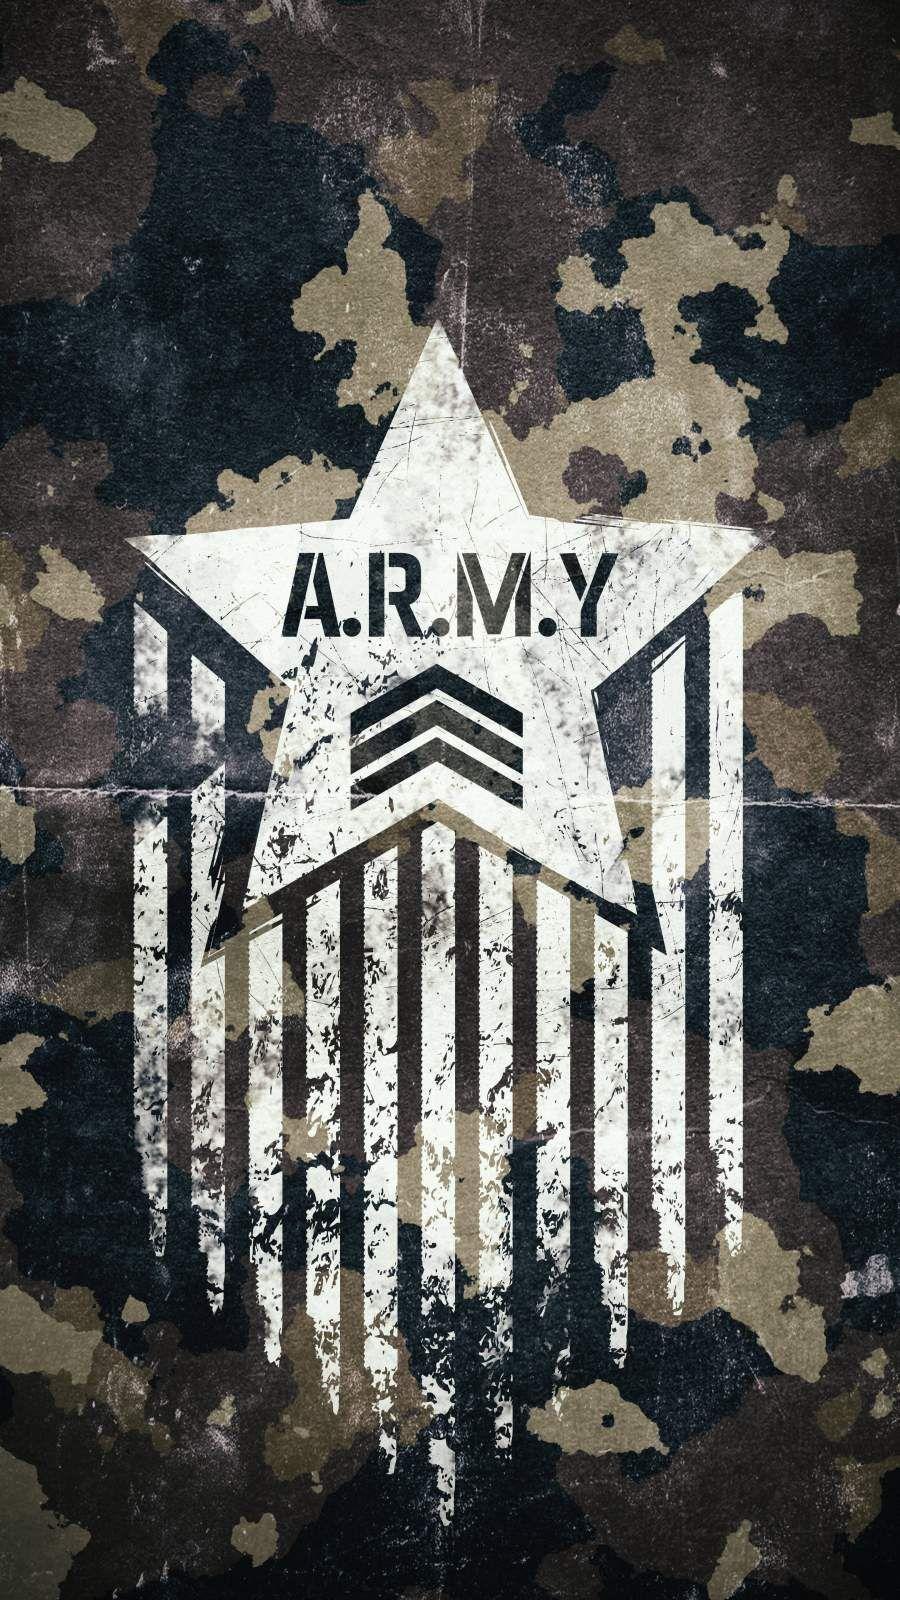 Black Commando Camouflage Iphone Wallpaper Iphone Wallpapers Iphone Wallpapers Camouflage Wallpaper Iphone Wallpaper Images Iphone Wallpaper